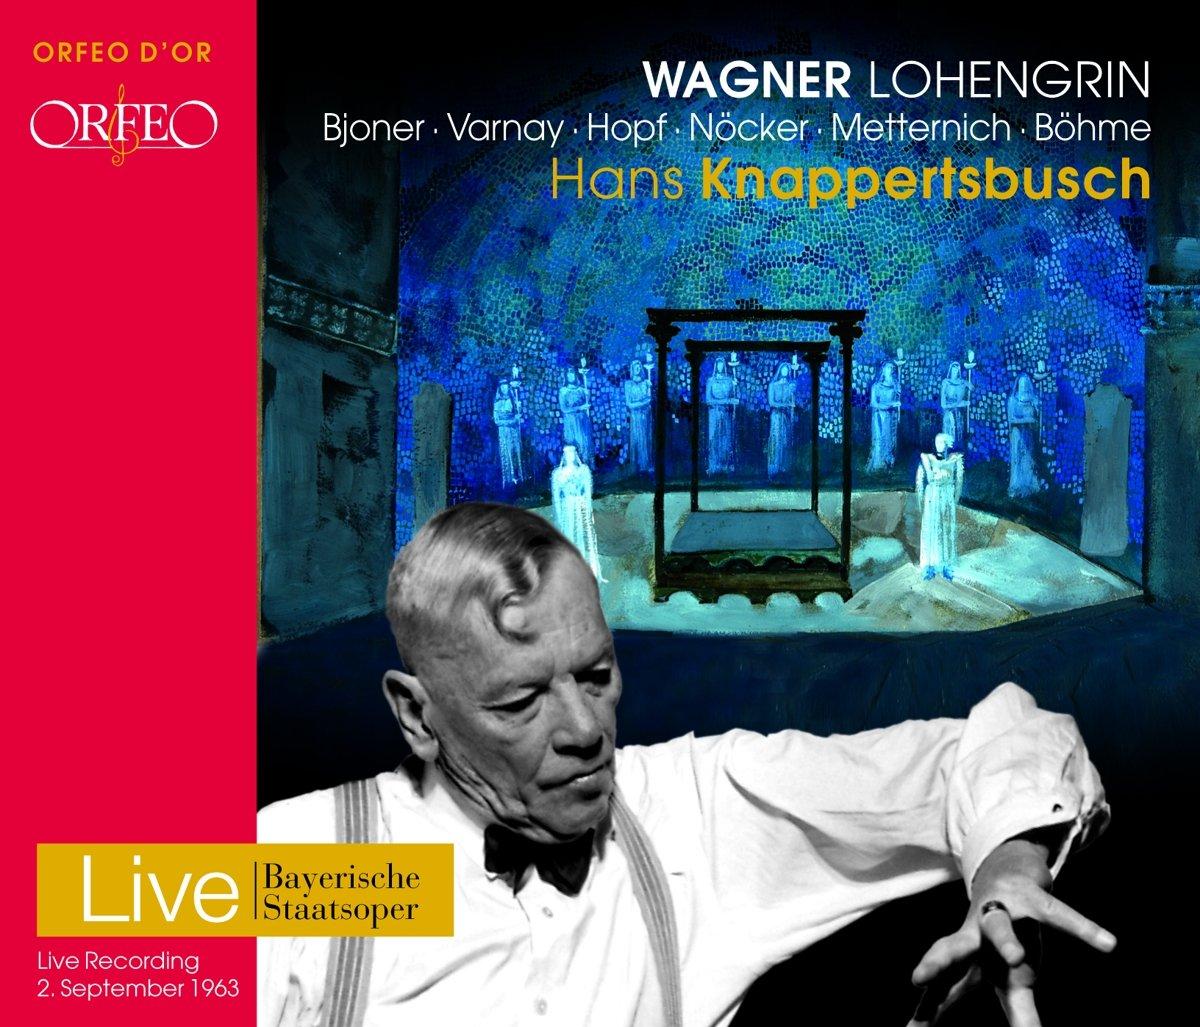 Wagner - Lohengrin - Page 19 71zp8HkkGZL._SL1200_